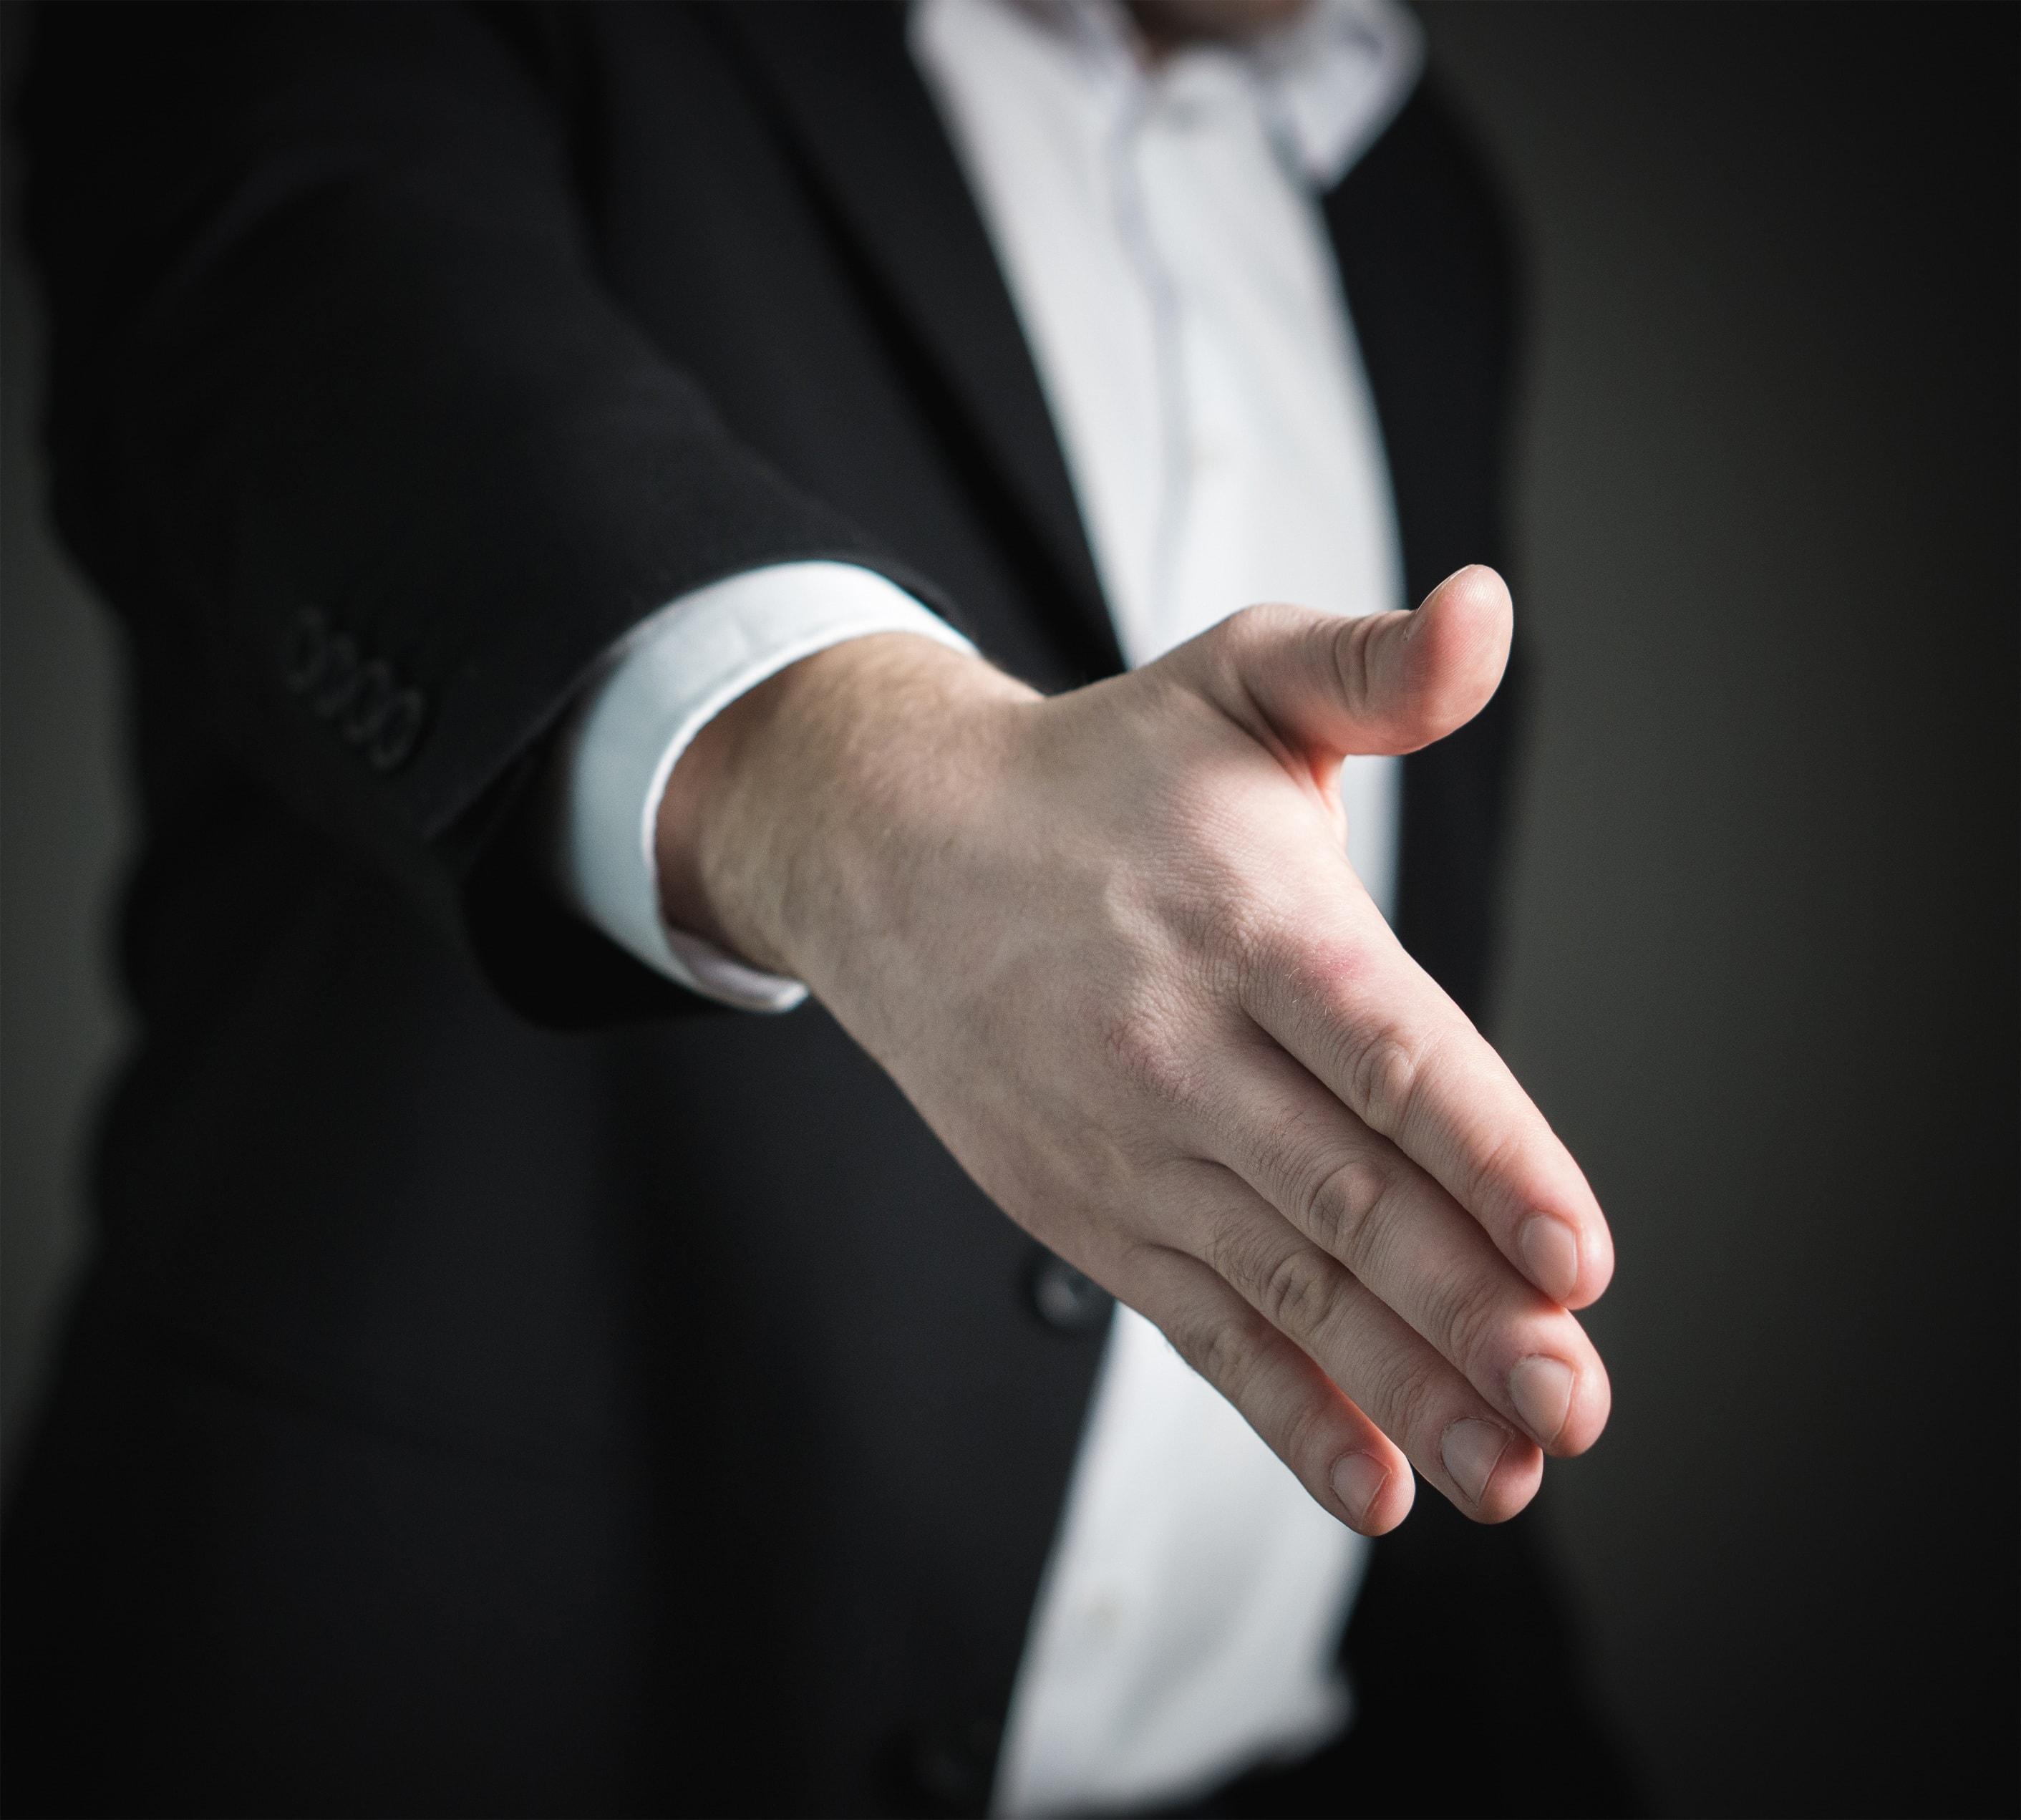 Buy-Sell Arrangements